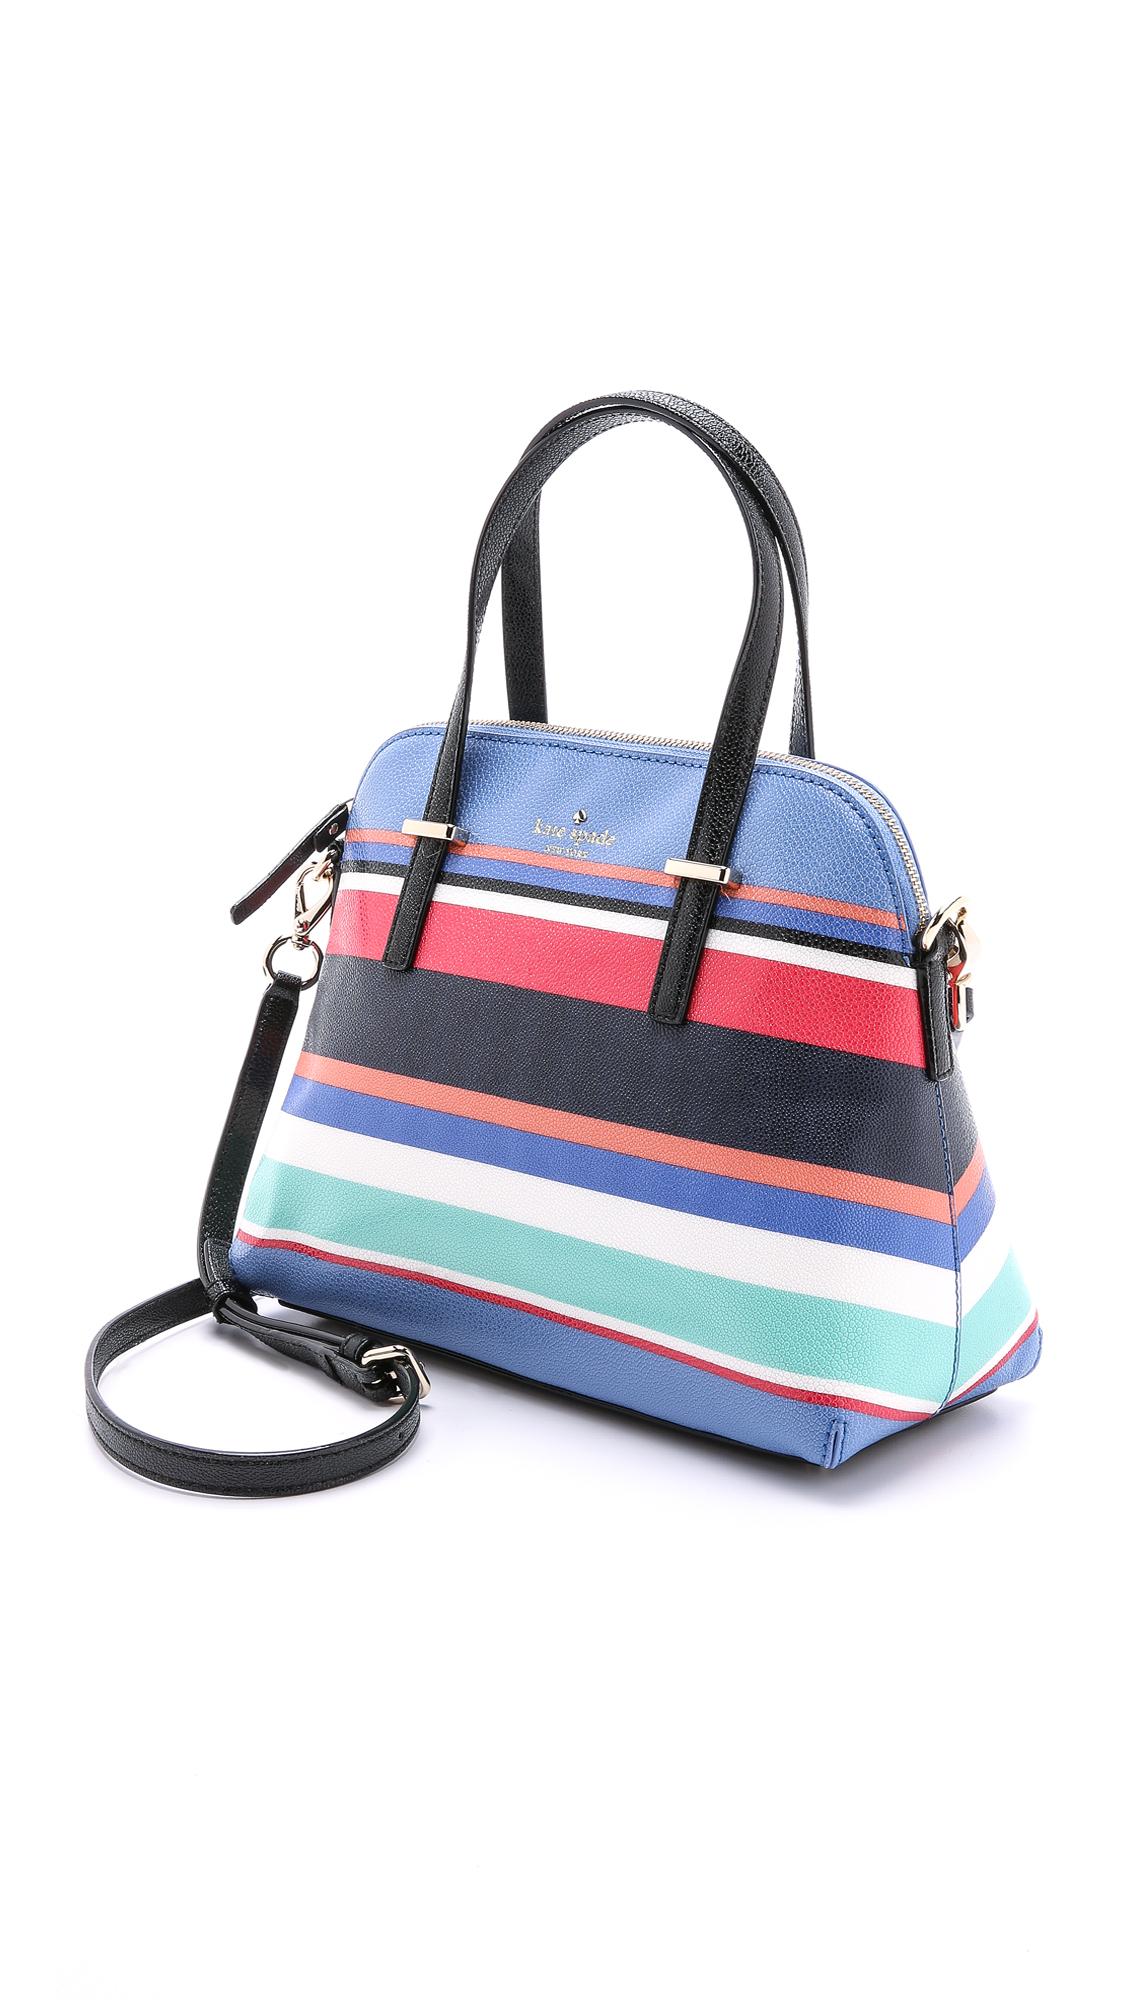 Kate spade striped purse